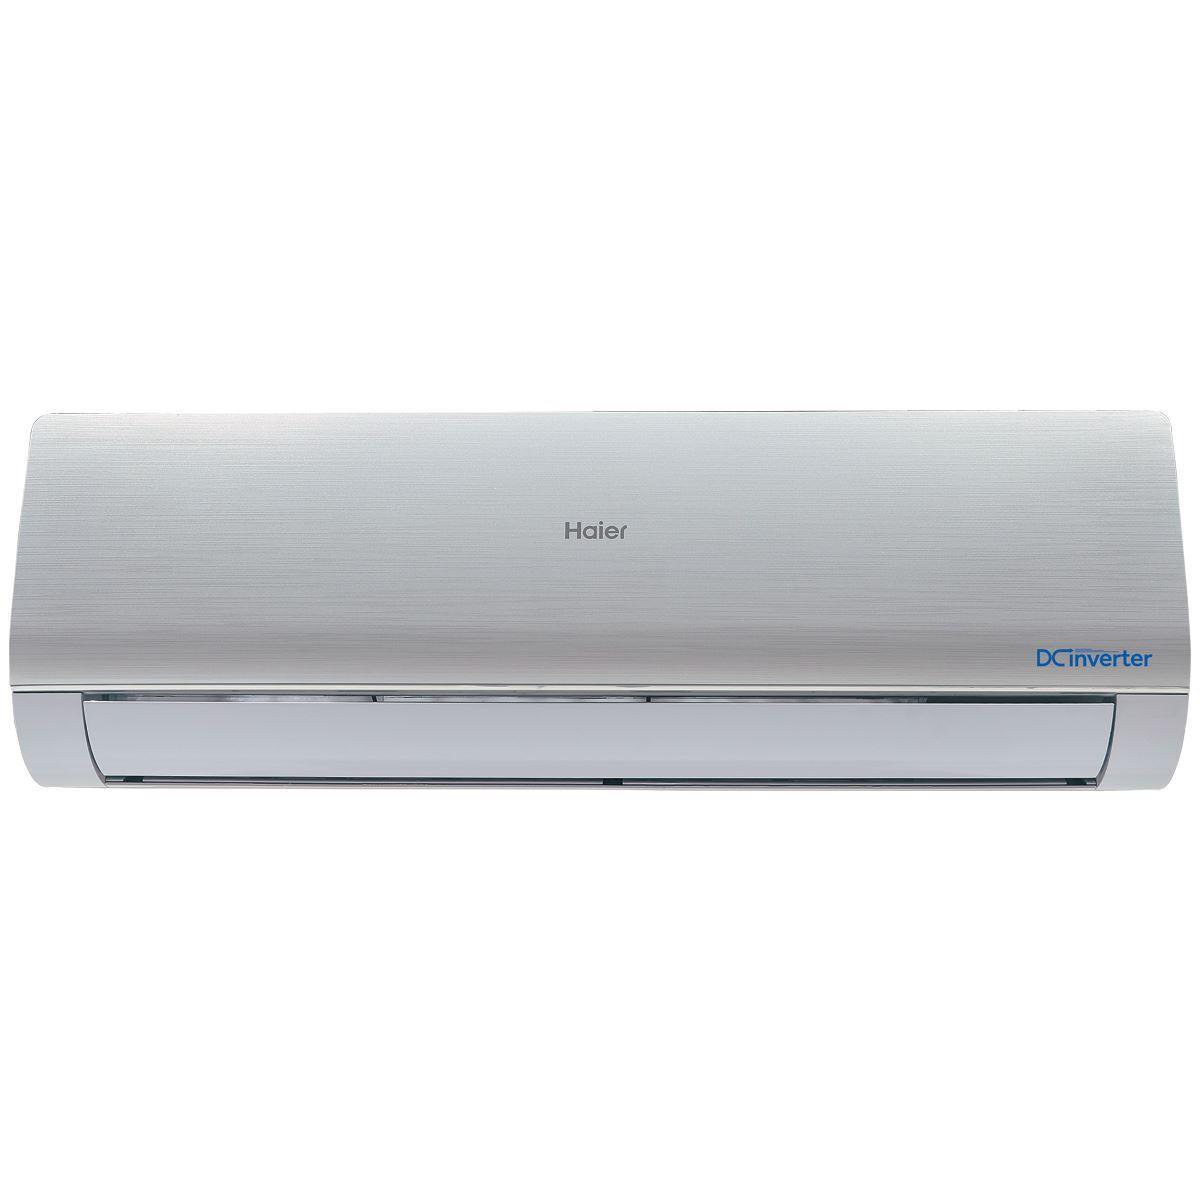 d18f7236b Haier 12SNF 1.0 Ton Inverter AC Price in Pakistan-Homeshopping